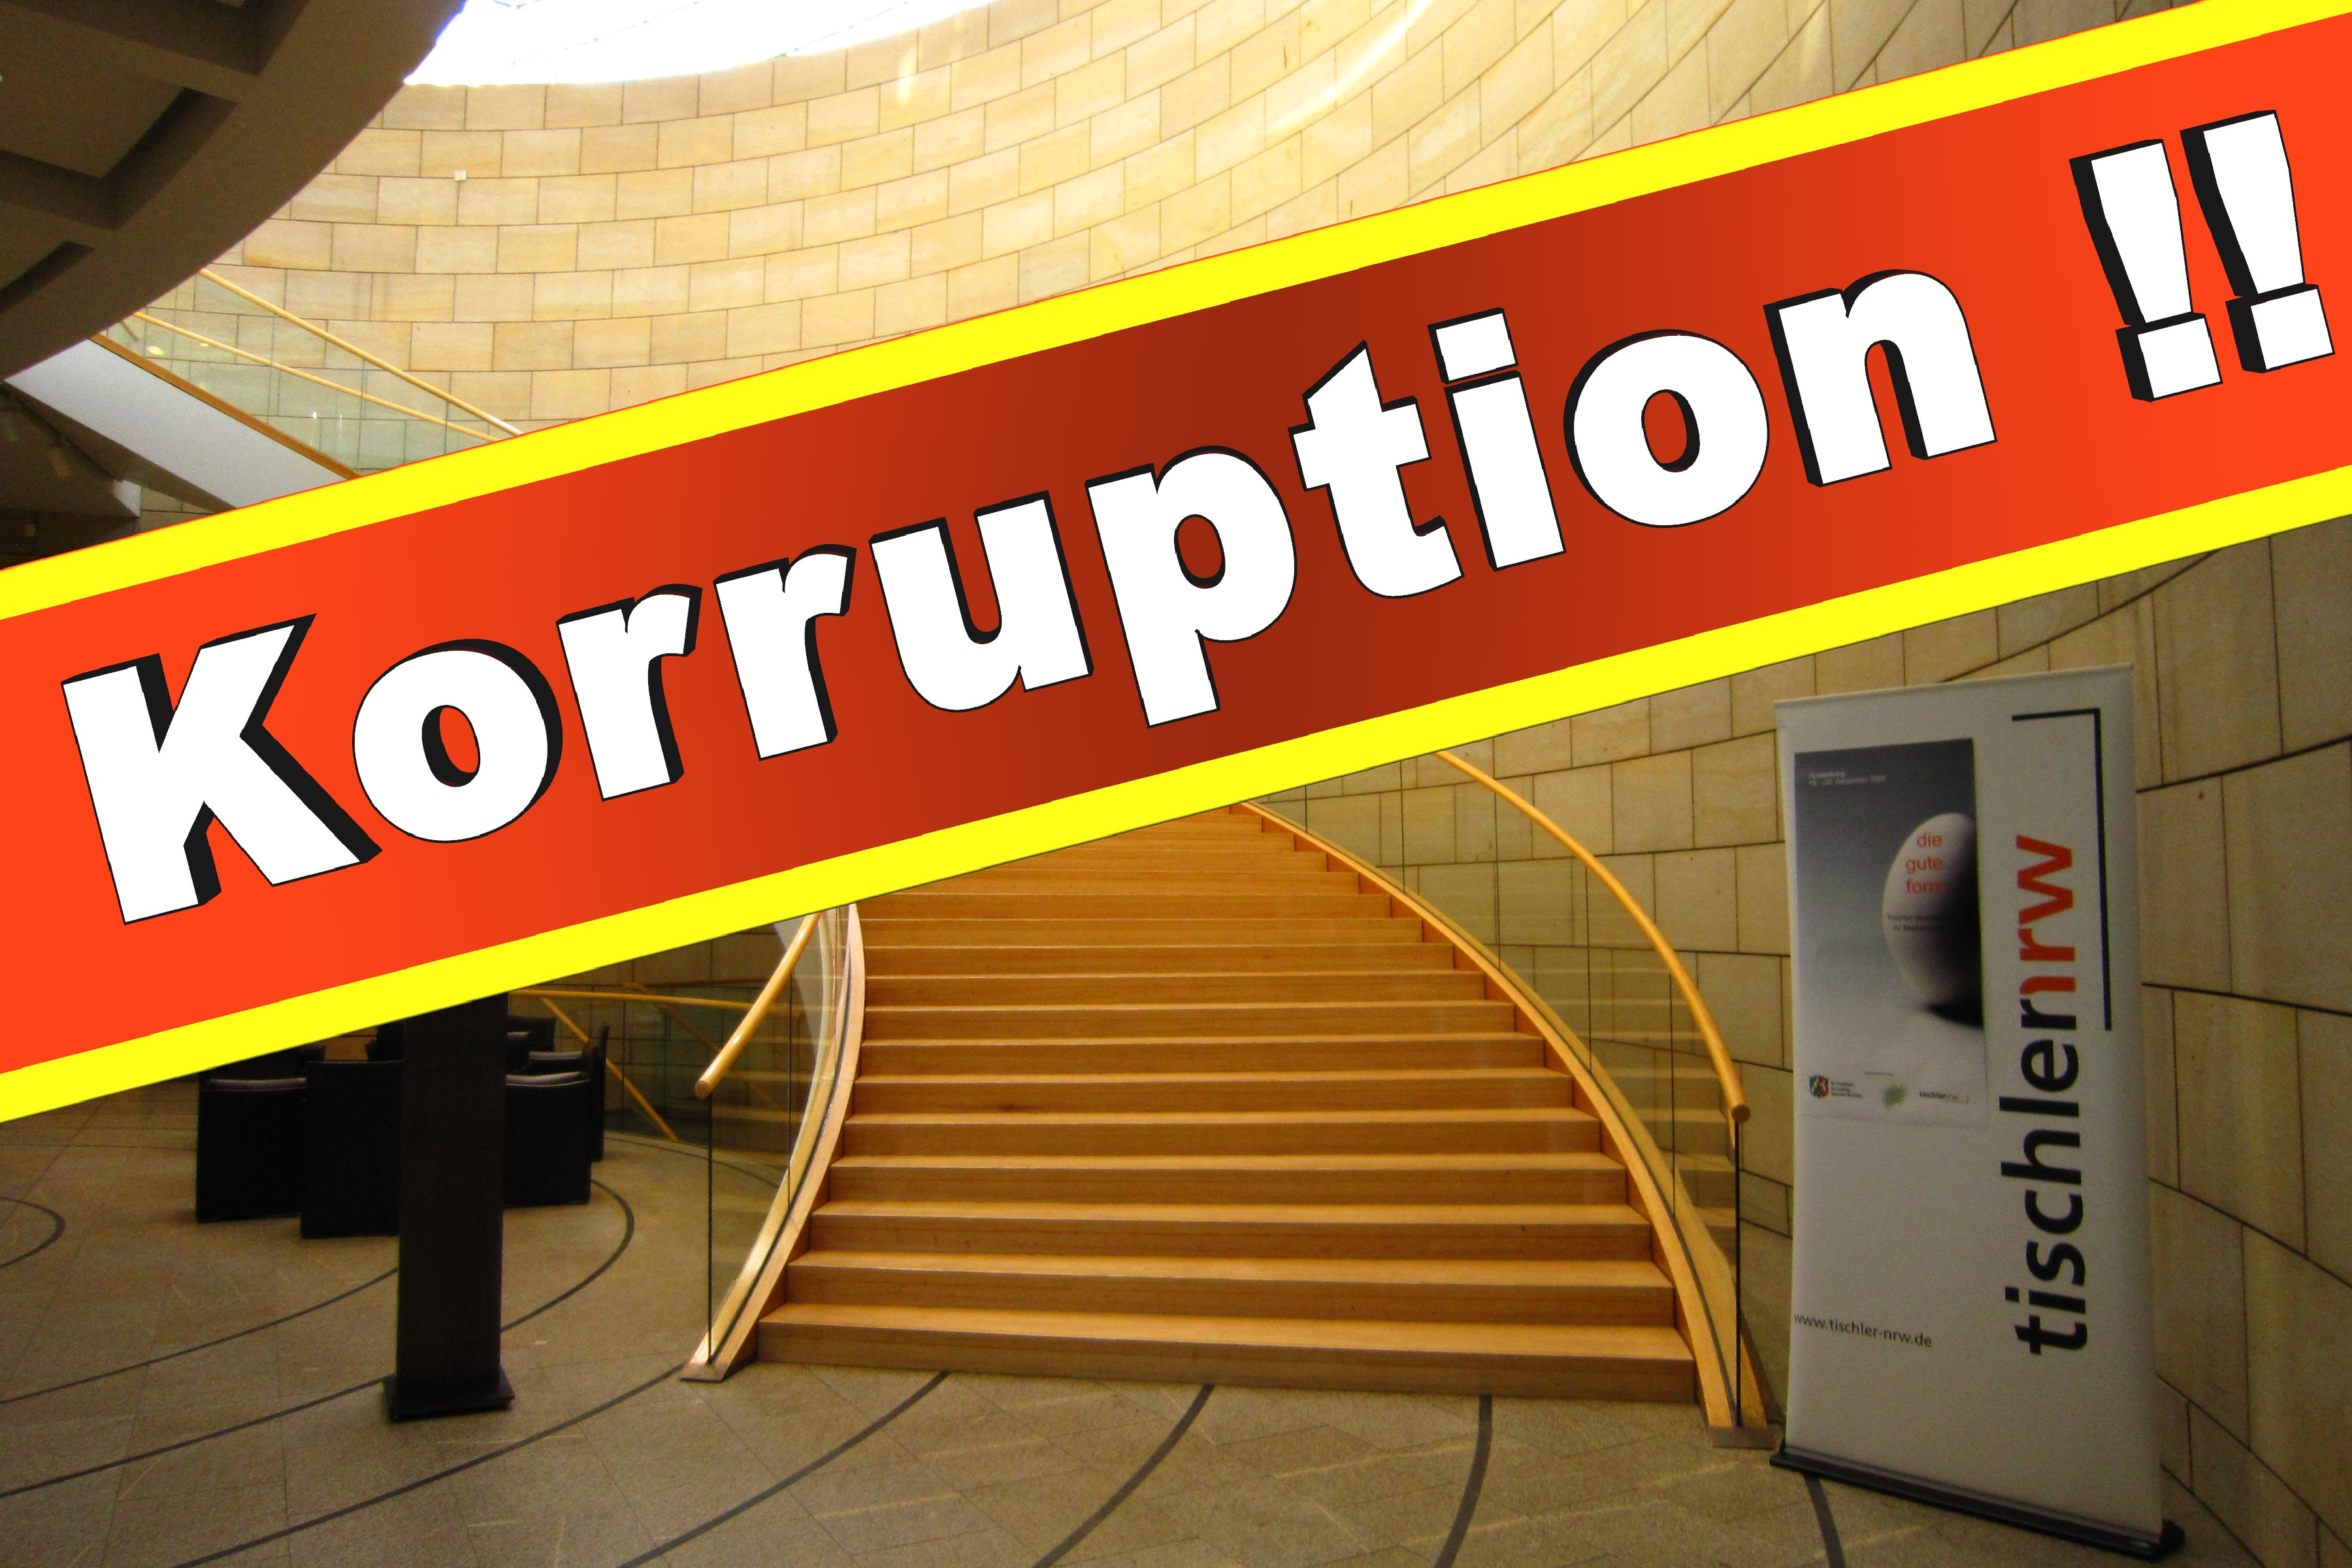 Landtag Nrw Wiki Landtag Nrw Wahlen Nrw Landtag Koalition Nrw Landtag Sitzverteilung Landtag Nrw 2017 Landtag Nrw Jobs Landtag Of North Rhine Westphalia Political (4)